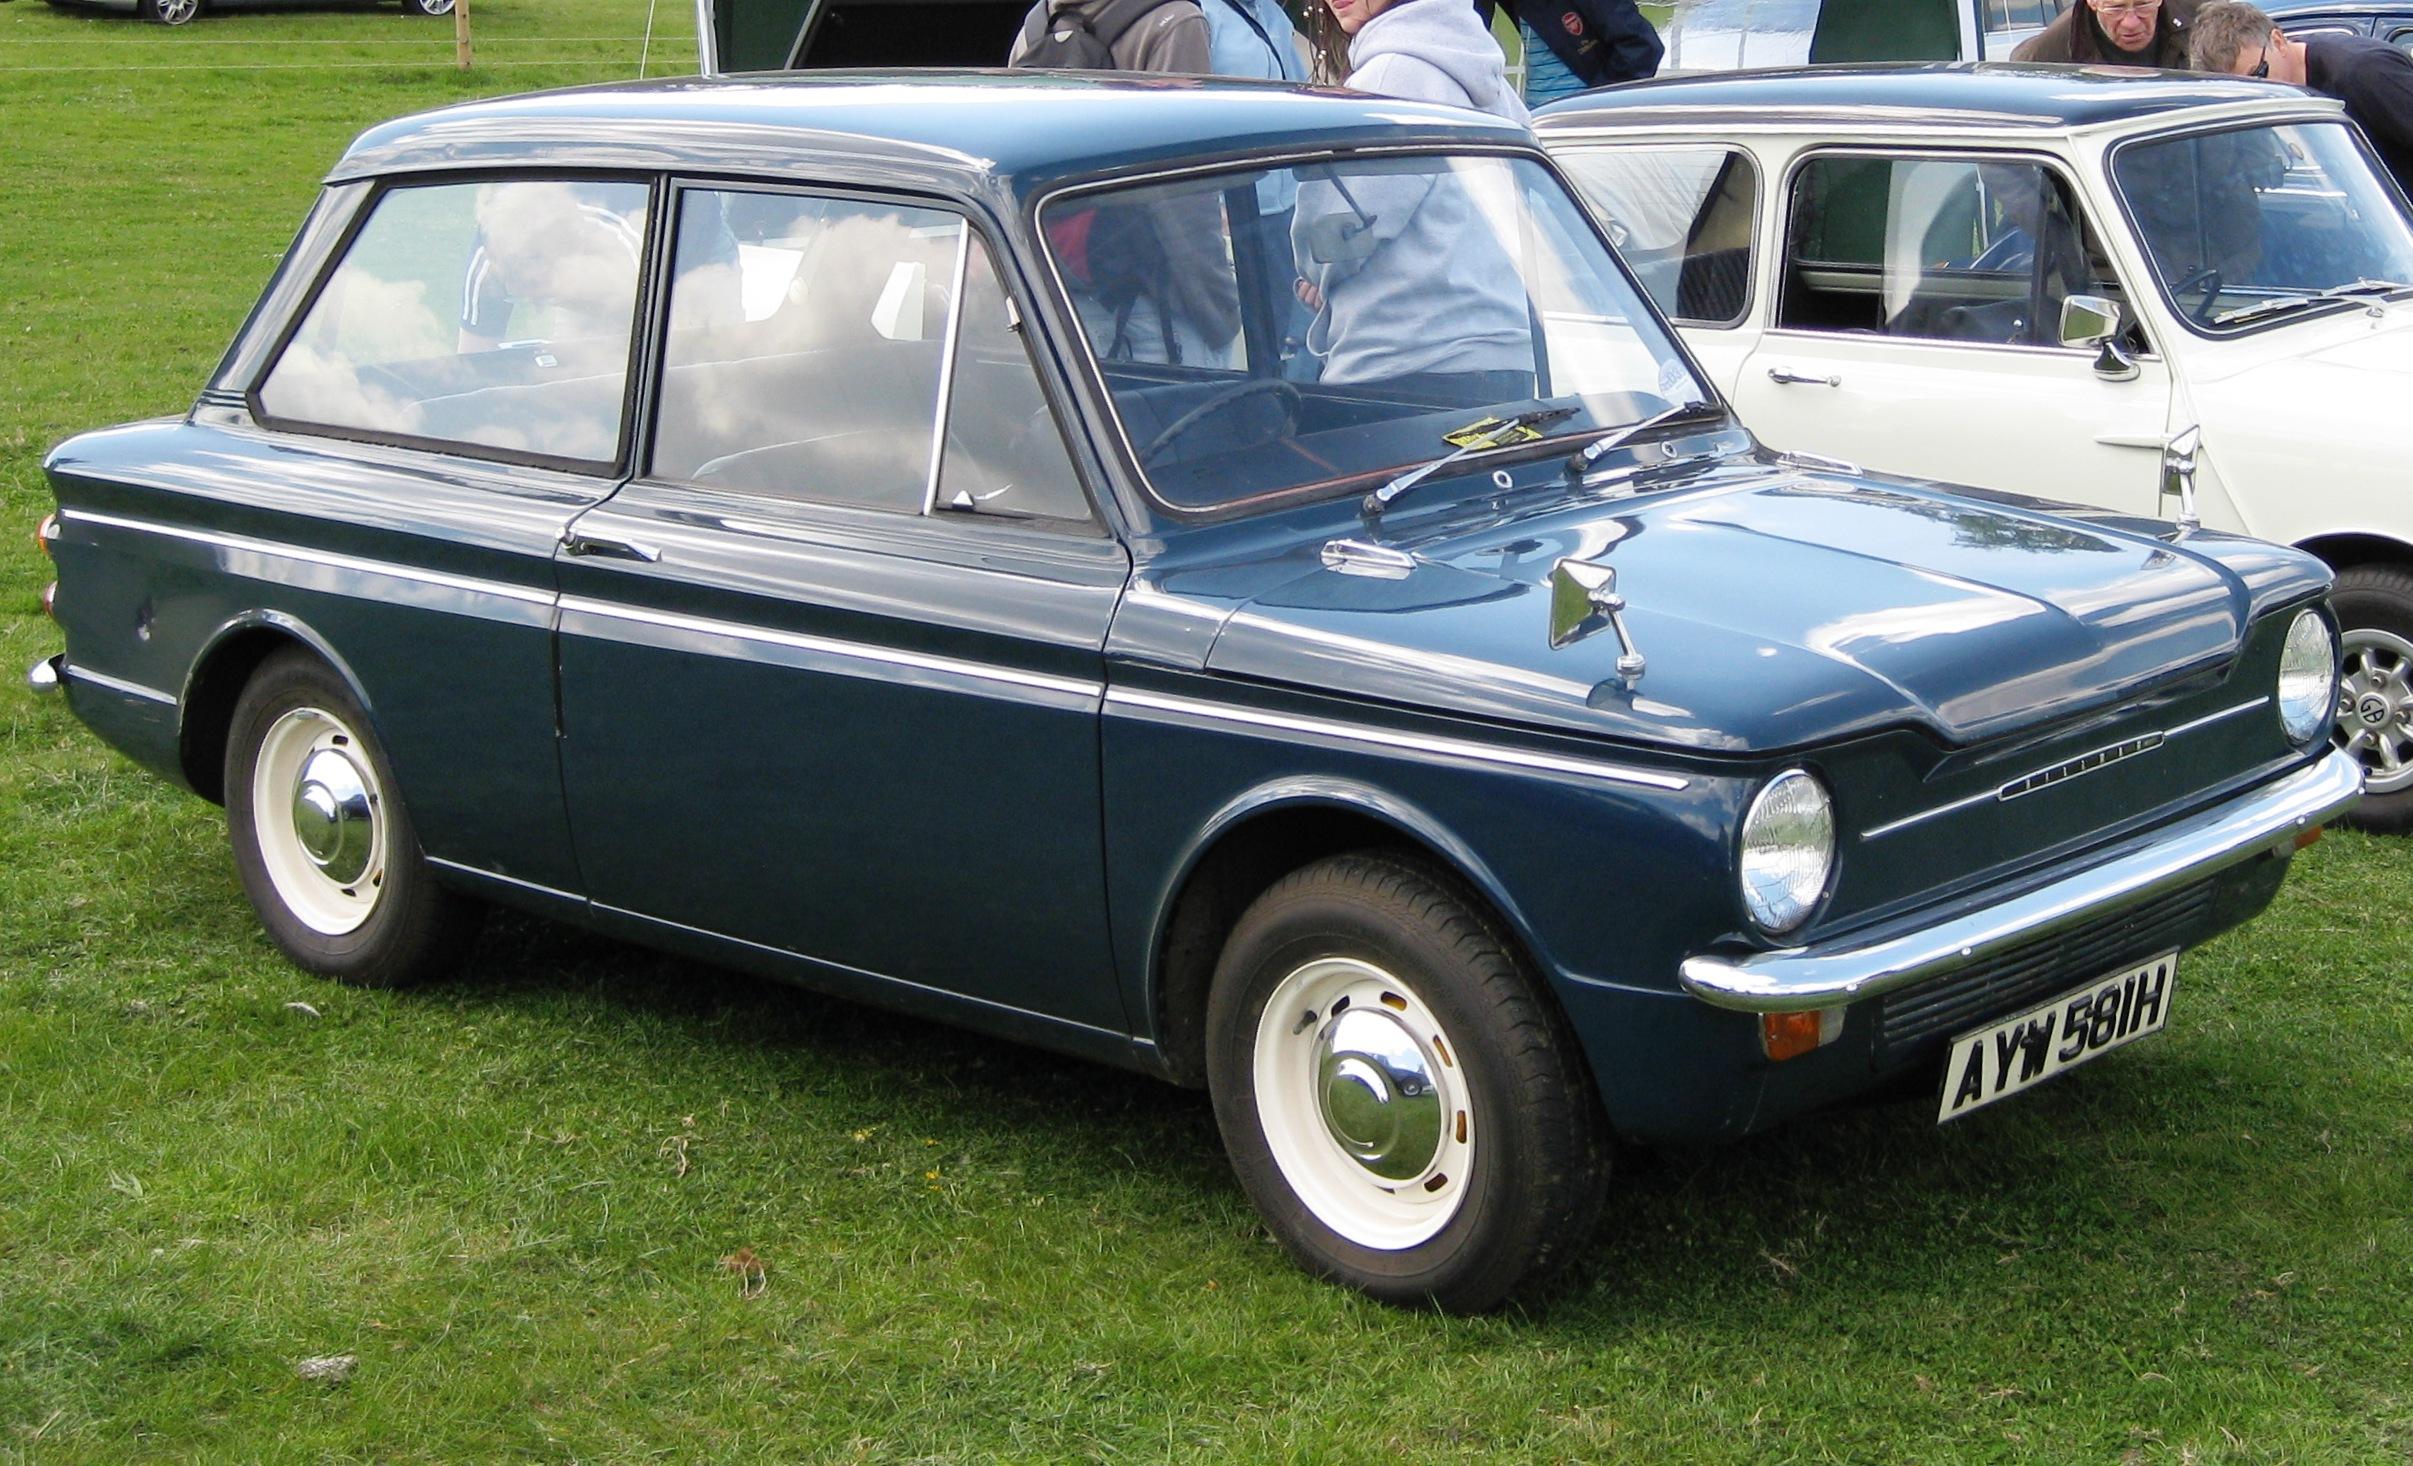 Sport Cars For Sale >> File:Hillman Imp reg 1970 875 cc.JPG - Wikimedia Commons